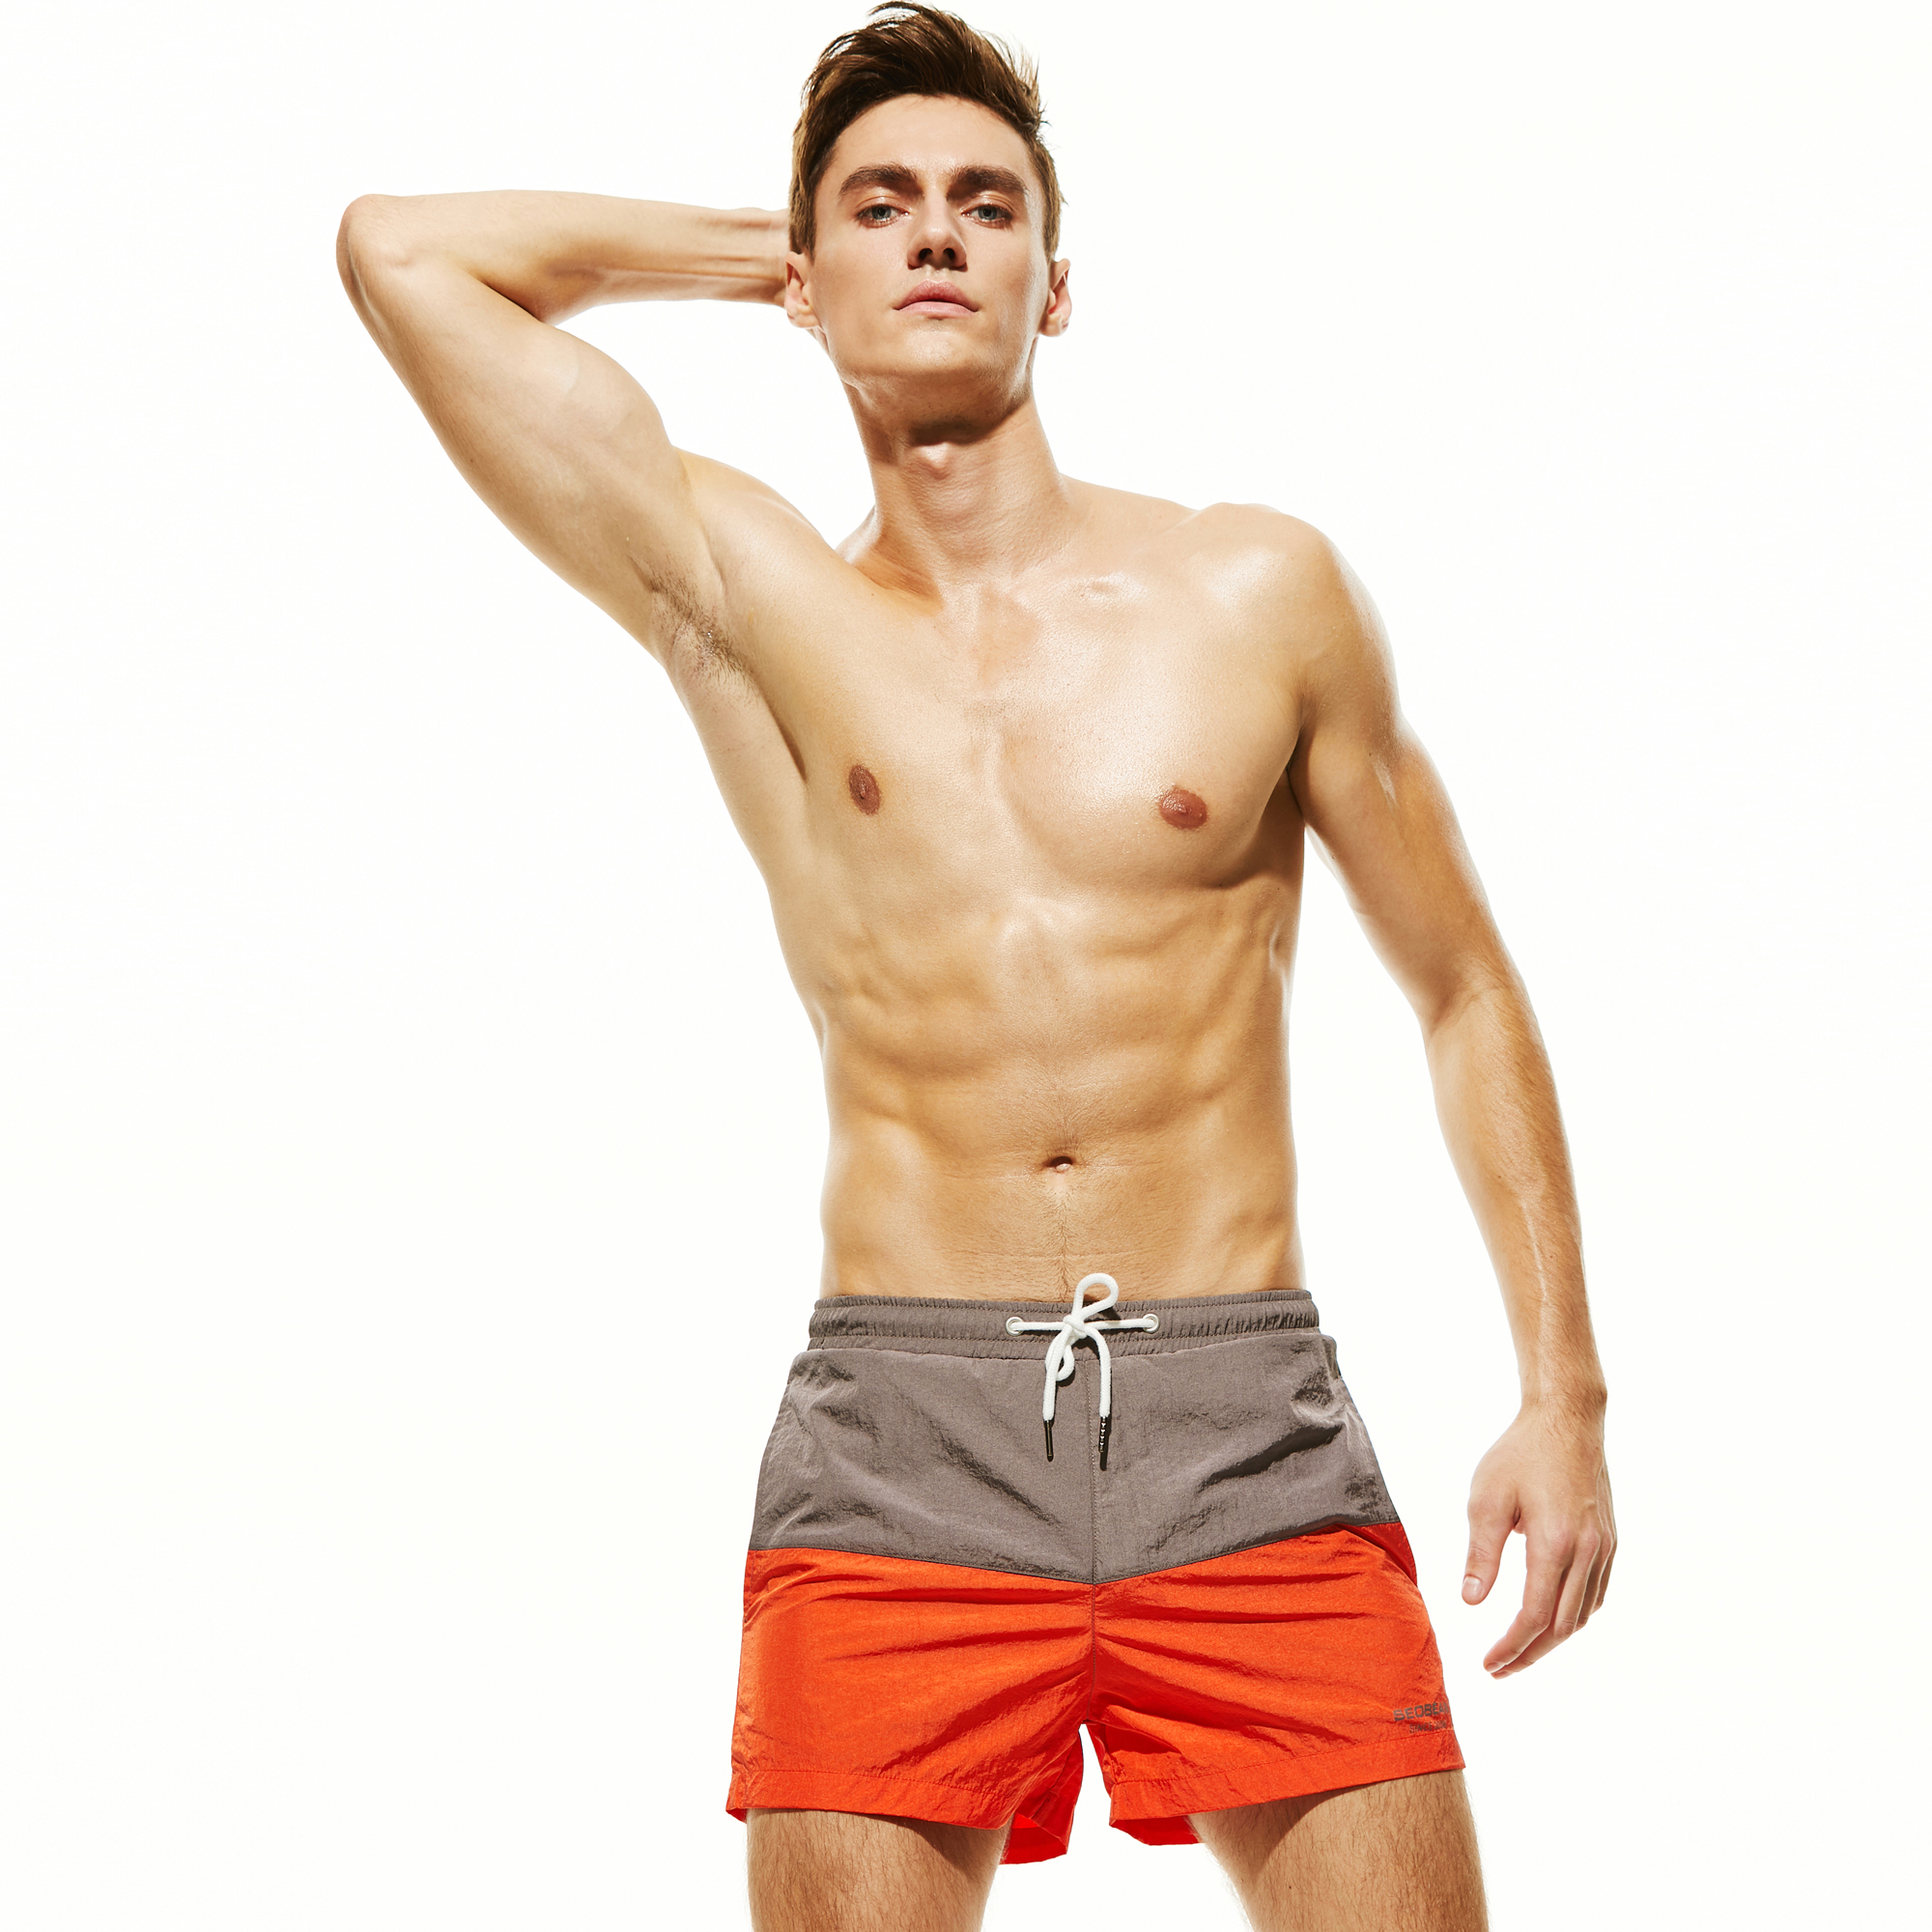 New Brand Swimsuit Men's Swimming Trunks Quick Dry Surf Beach Shorts Sport Swimwear Men Boardshorts Man Gym Bermuda Shorts